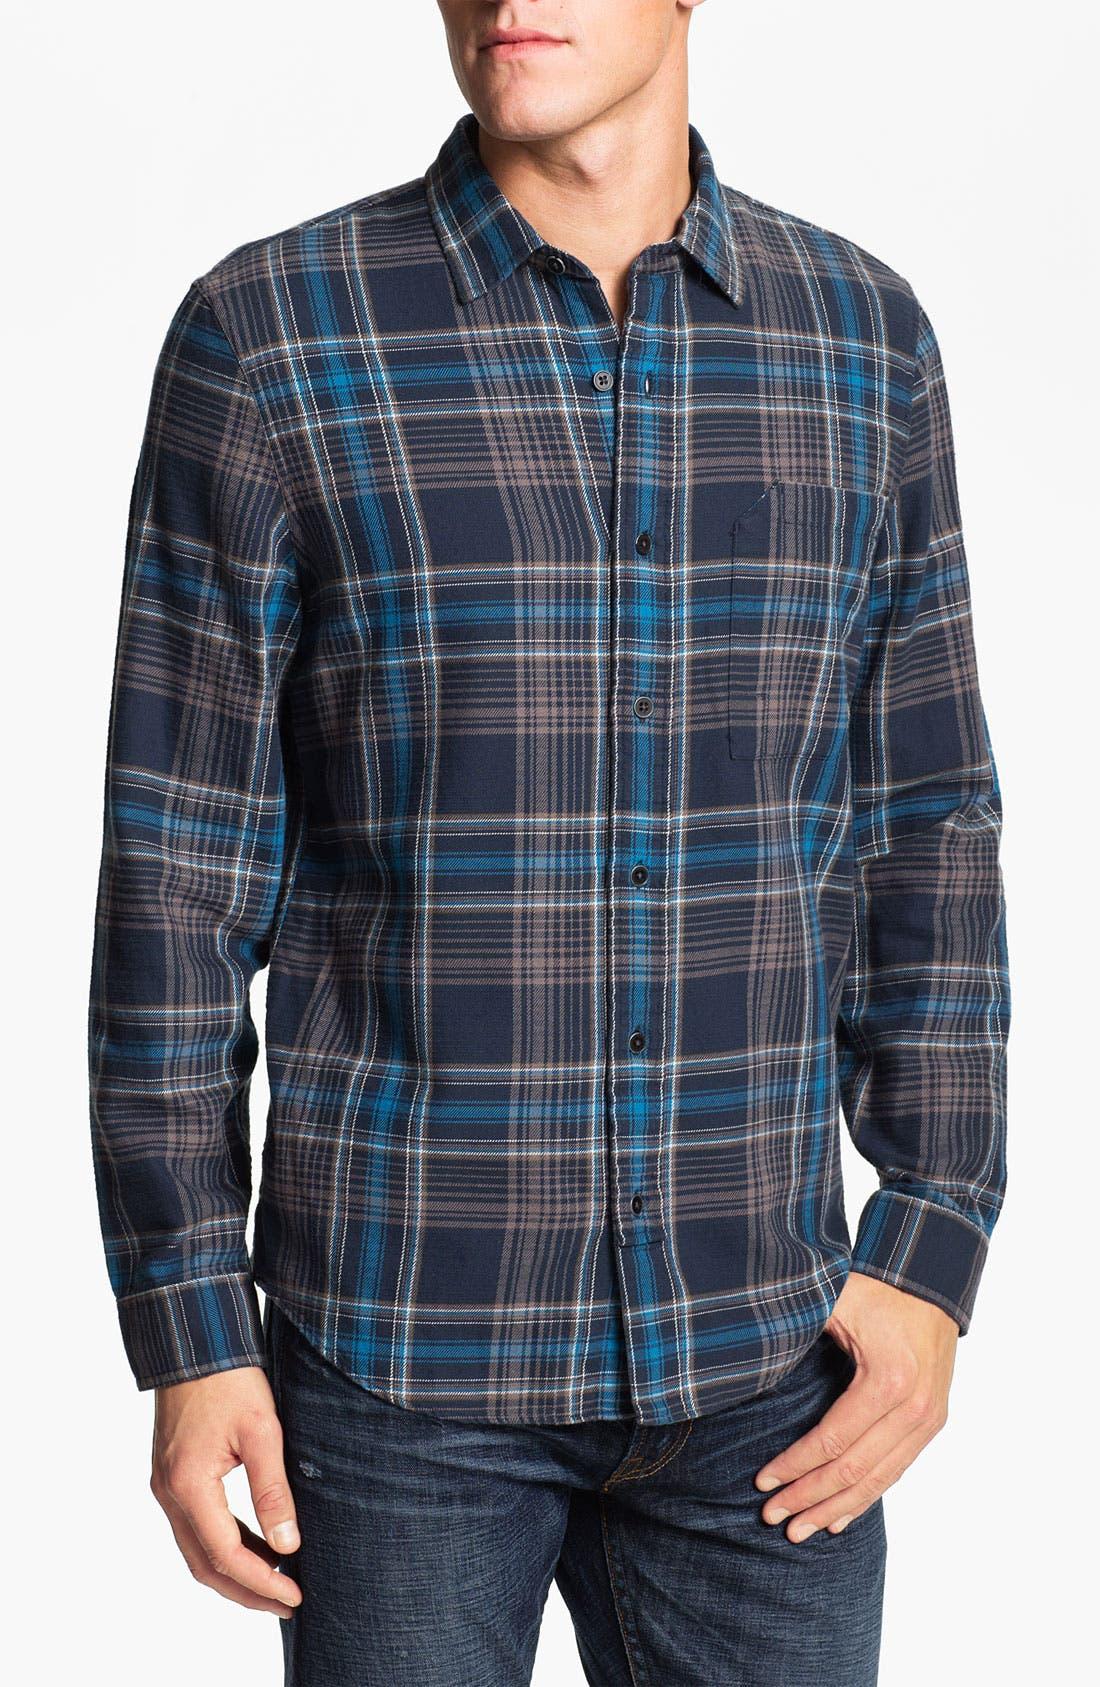 Main Image - R44 Rogan Standard Issue Flannel Work Shirt